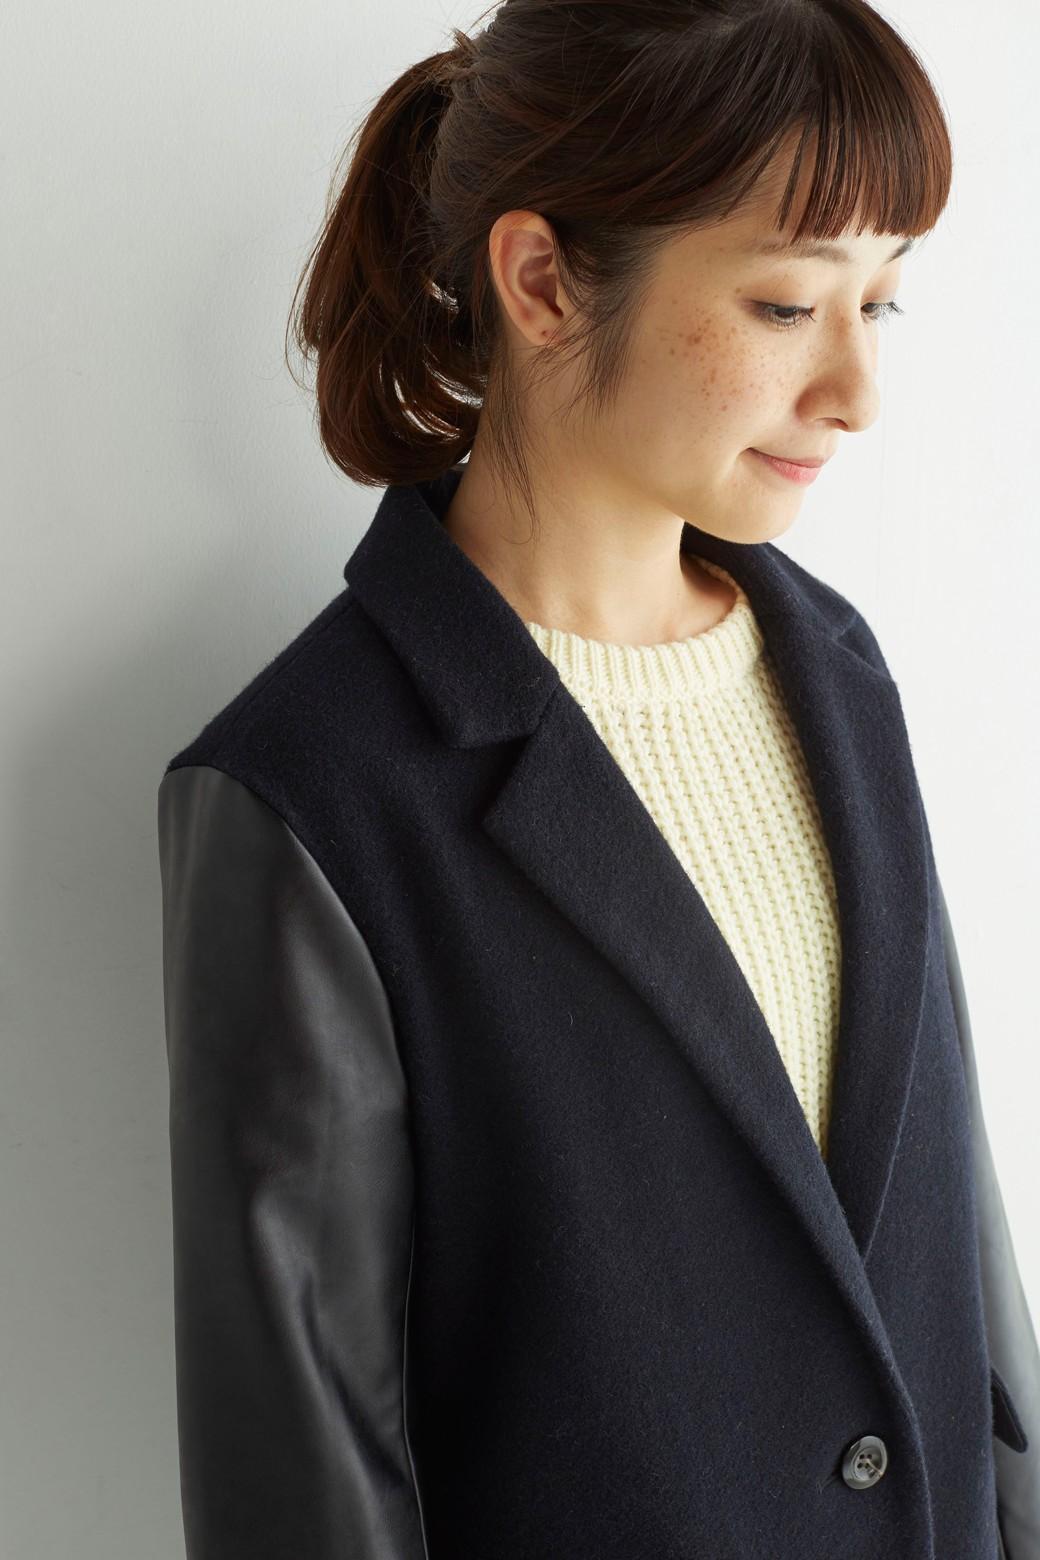 SHE THROUGH SEA ウール素材とフェイクレザー切り替えチェスターコート:ネイビー×ブラック <ネイビー>の商品写真8